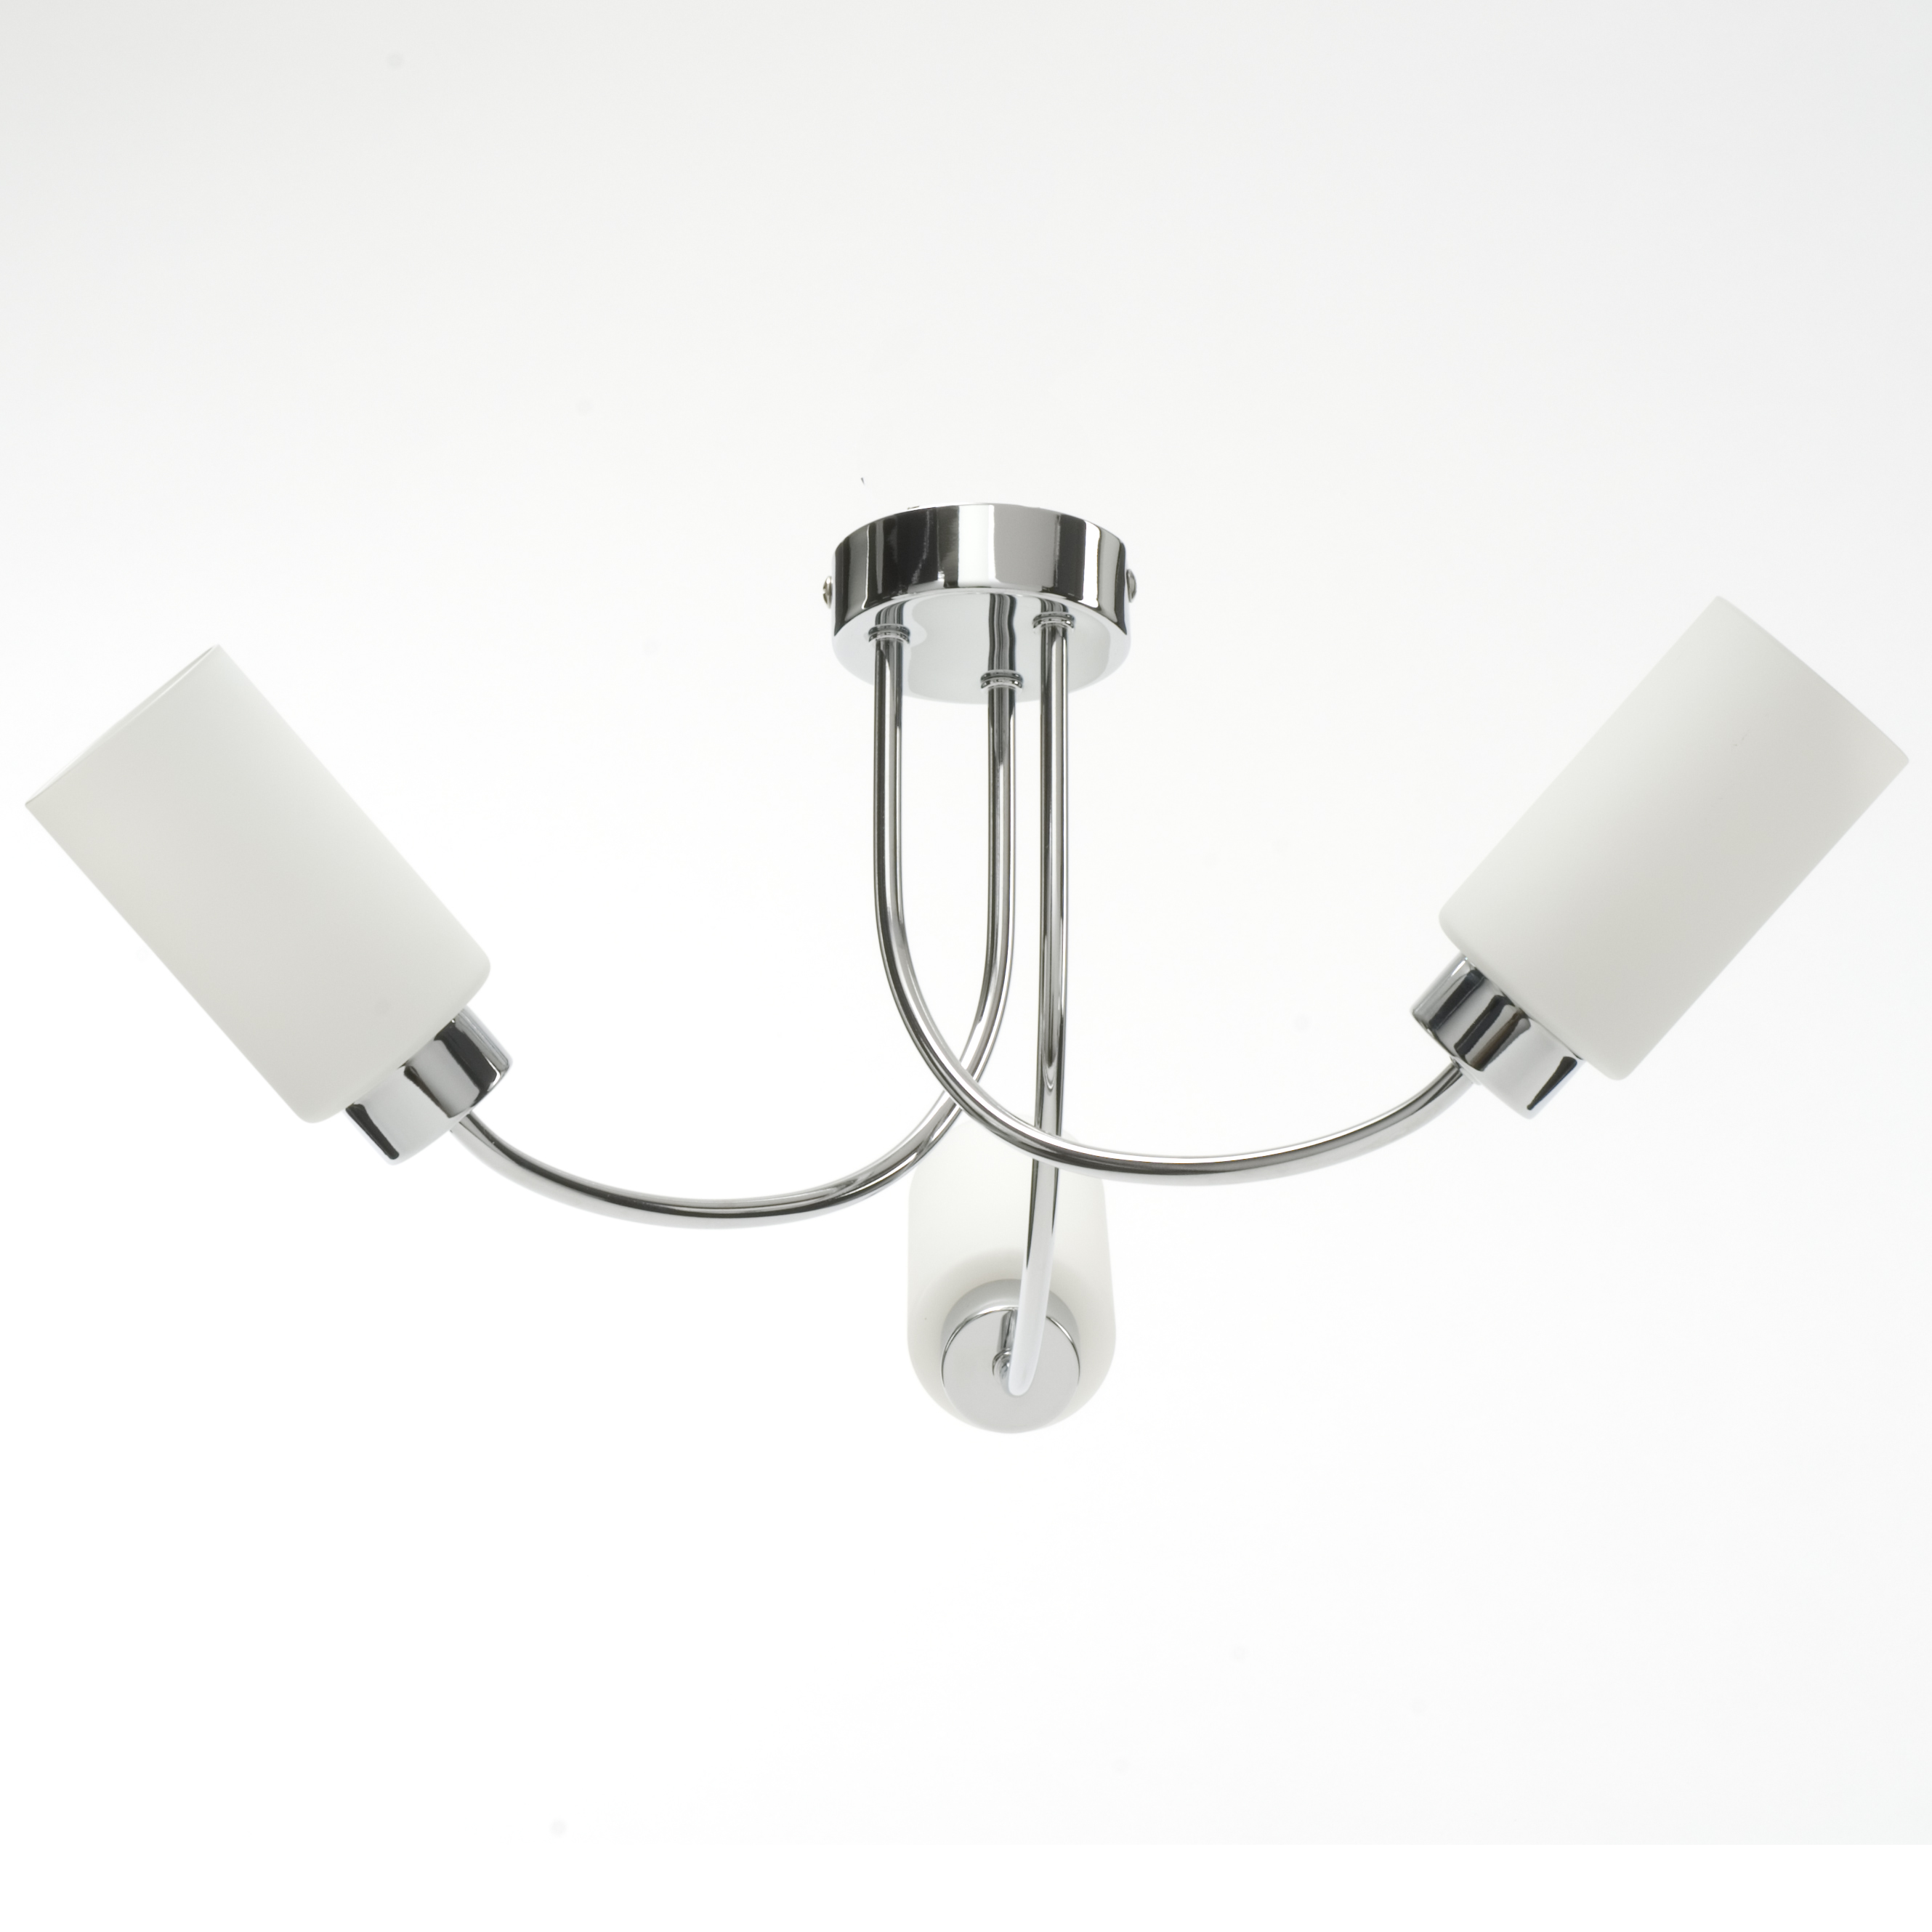 Modern Ceiling Lights Bar Lamp Silver Chandelier Lighting: Modern Silver Chrome And Opal Glass 3 Arm Ceiling Light